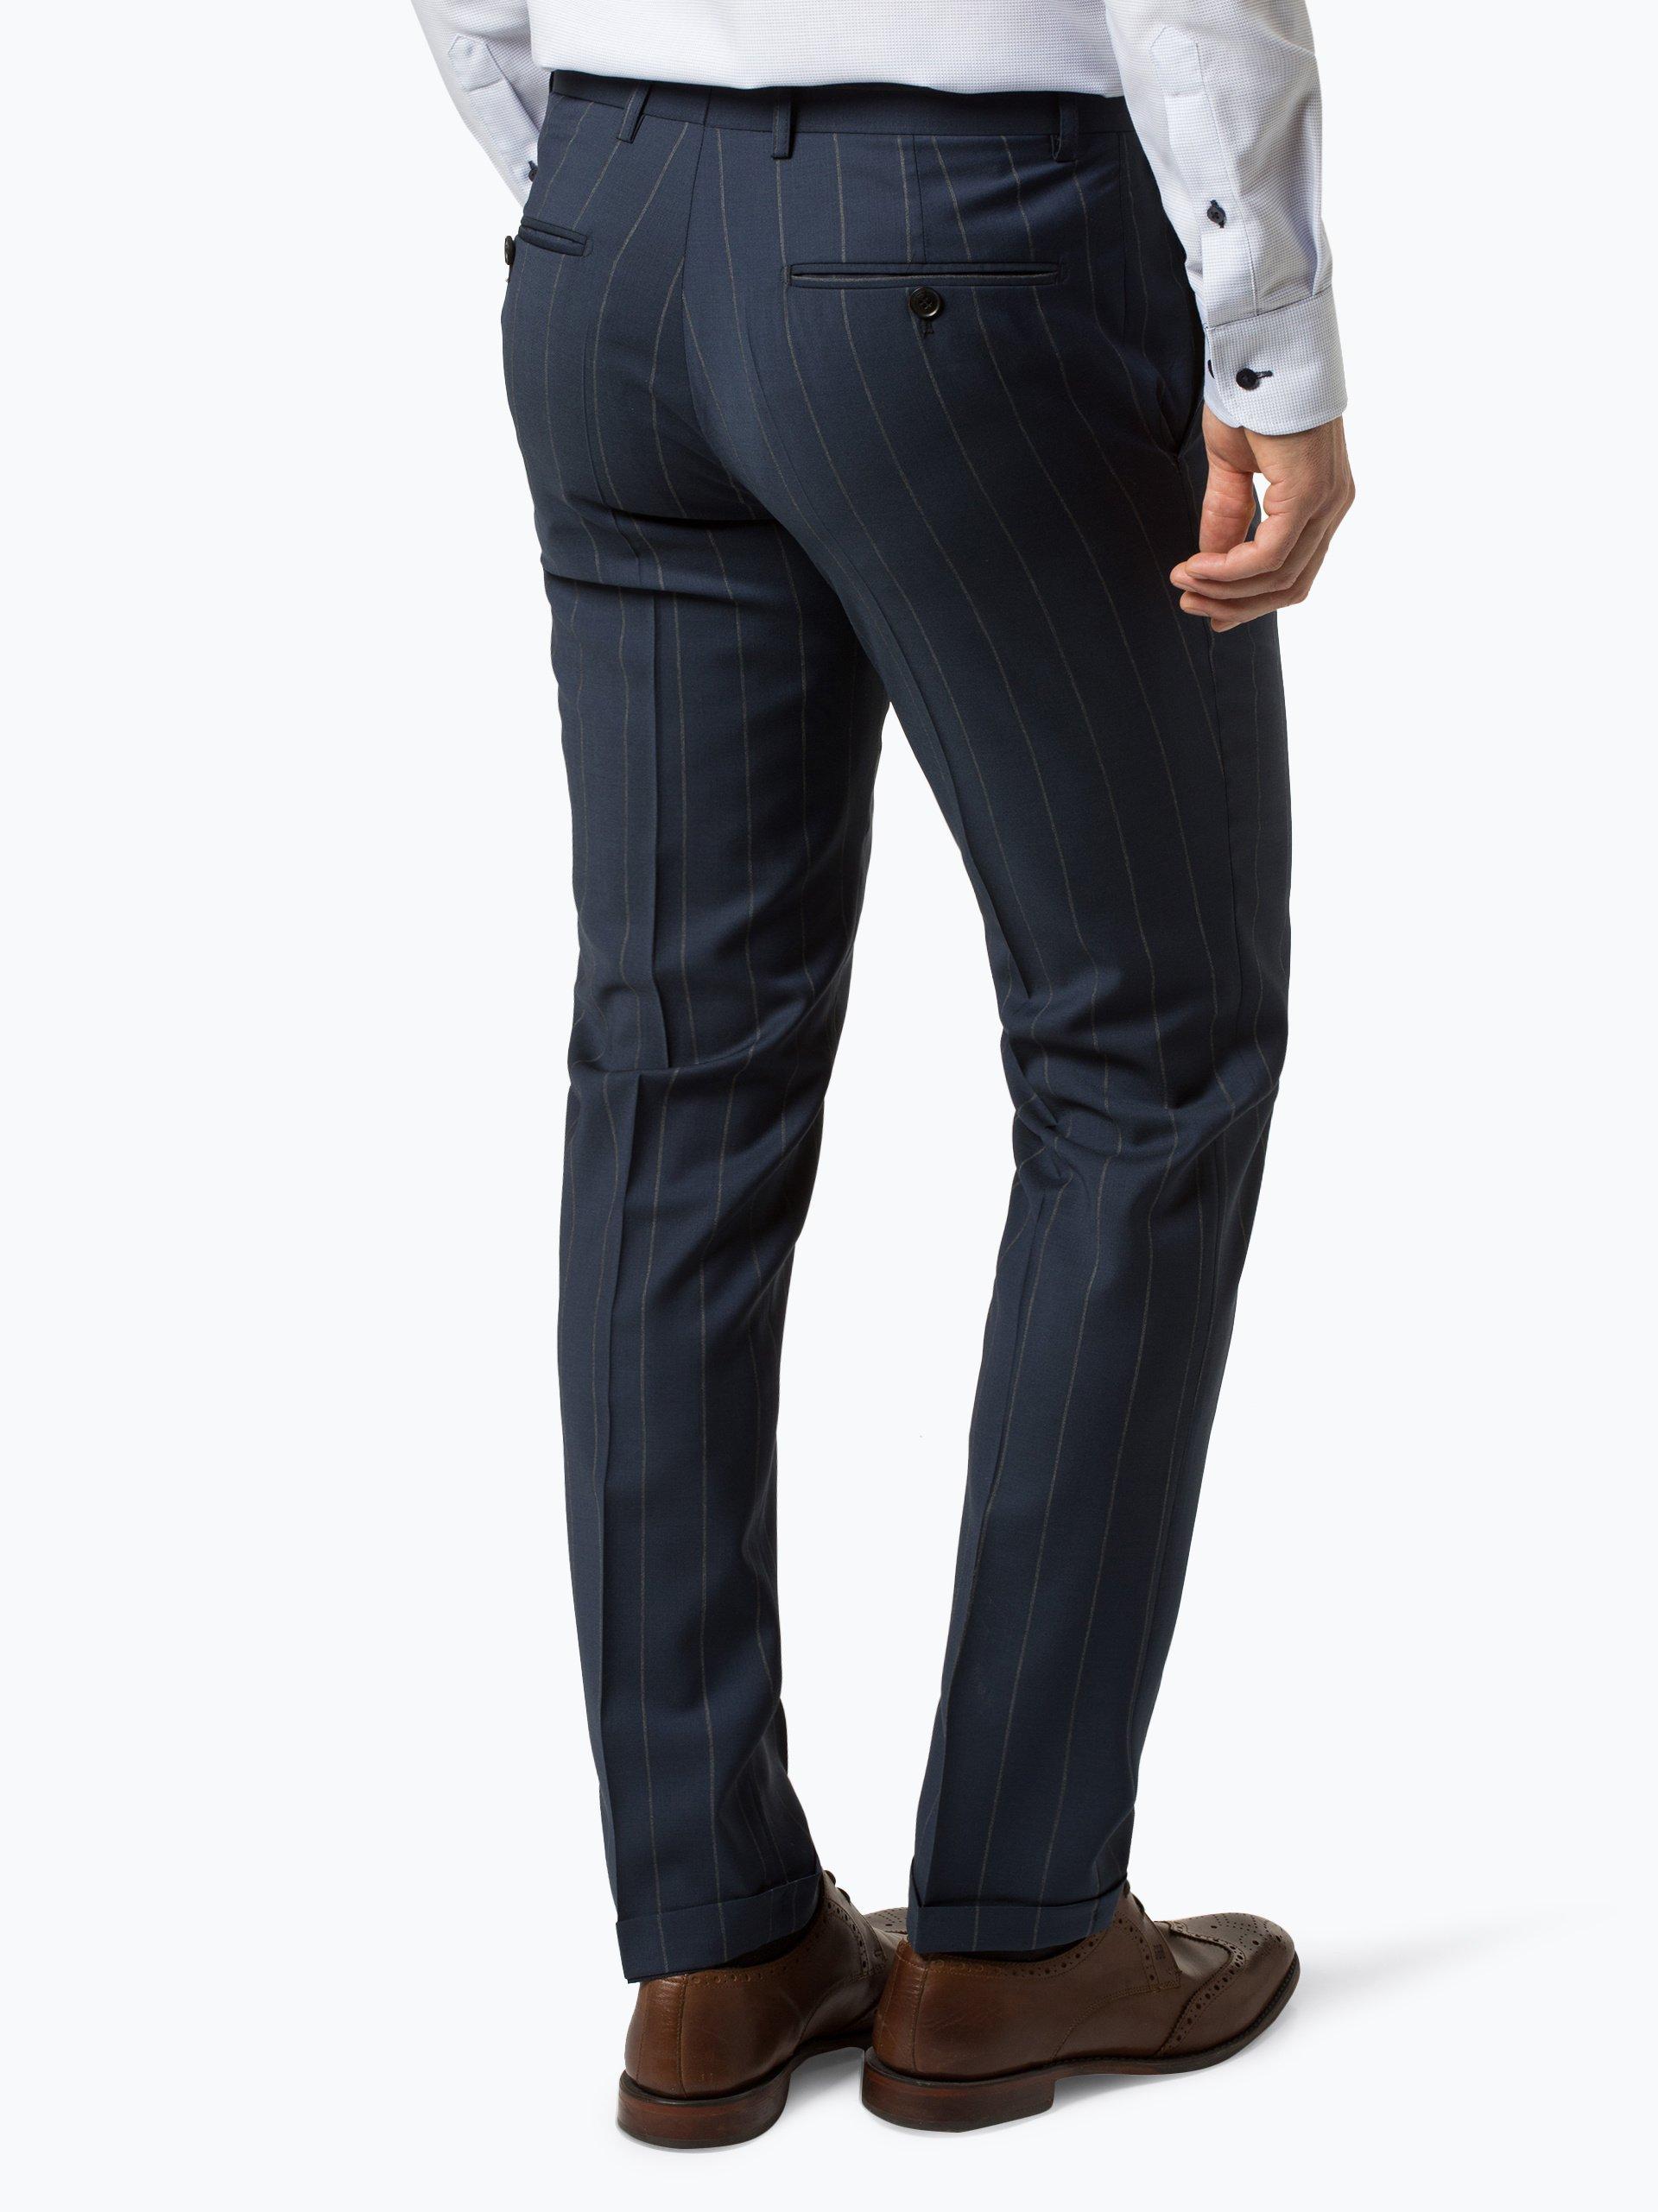 Finshley & Harding London Męskie spodnie od garnituru modułowego – Verso